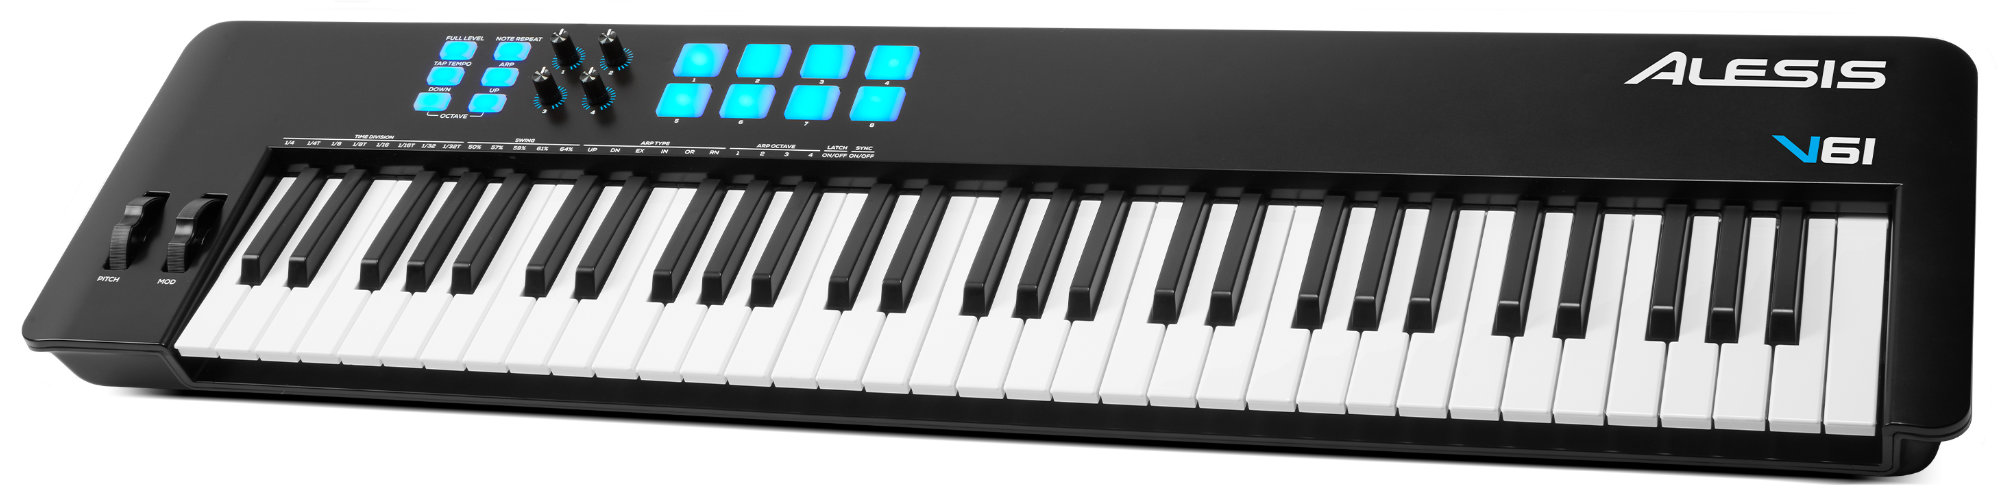 Midimasterkeyboards - Alesis V61 MKII MIDI Controller Keyboard - Onlineshop Musikhaus Kirstein